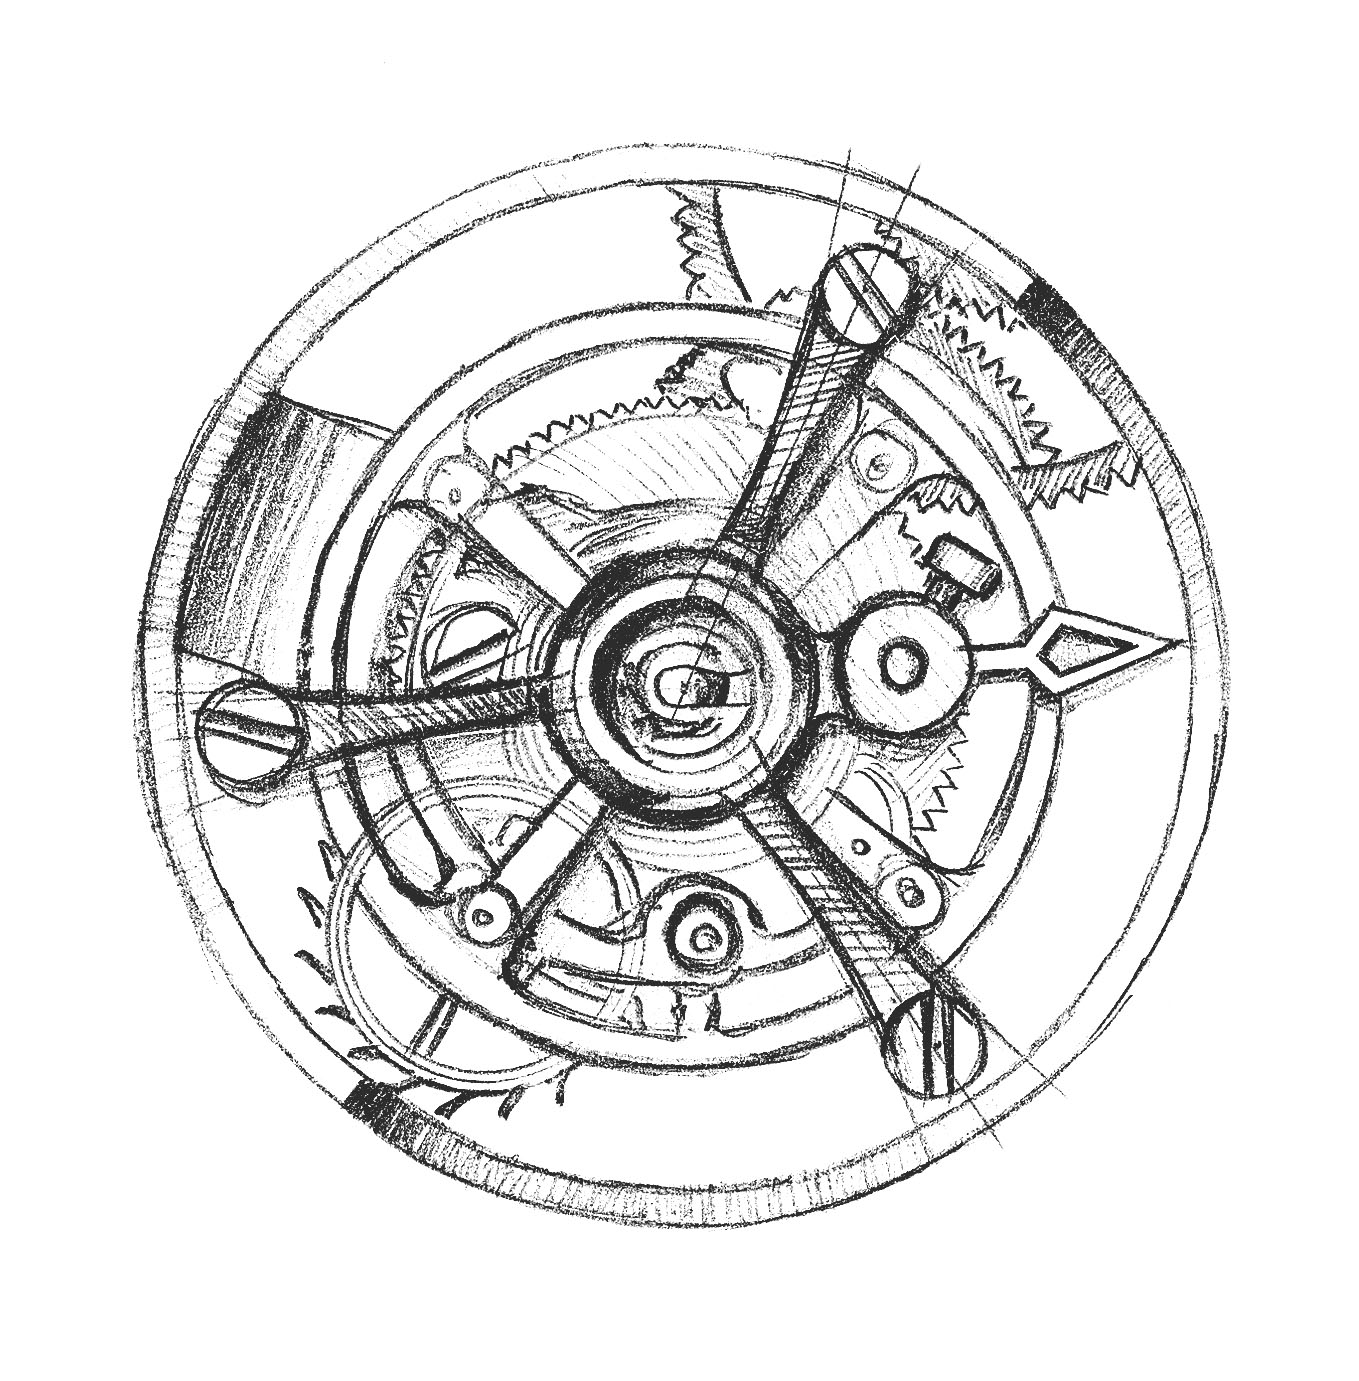 Sketch Chopard Flying Tourbillon